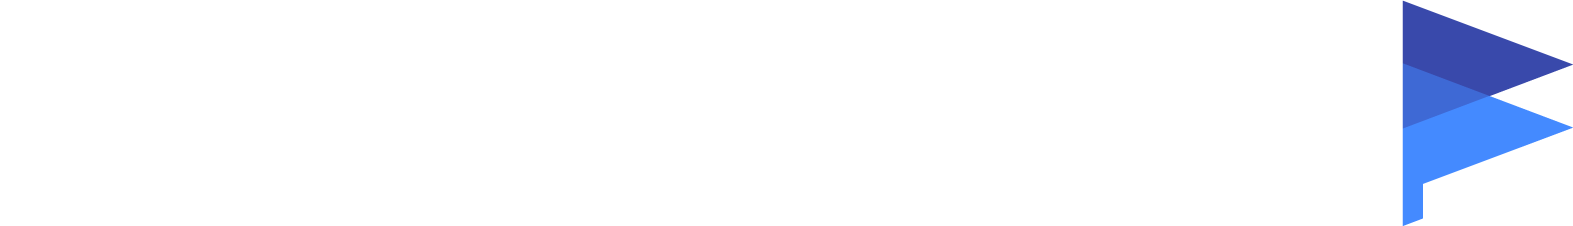 FanThreeSixty logo